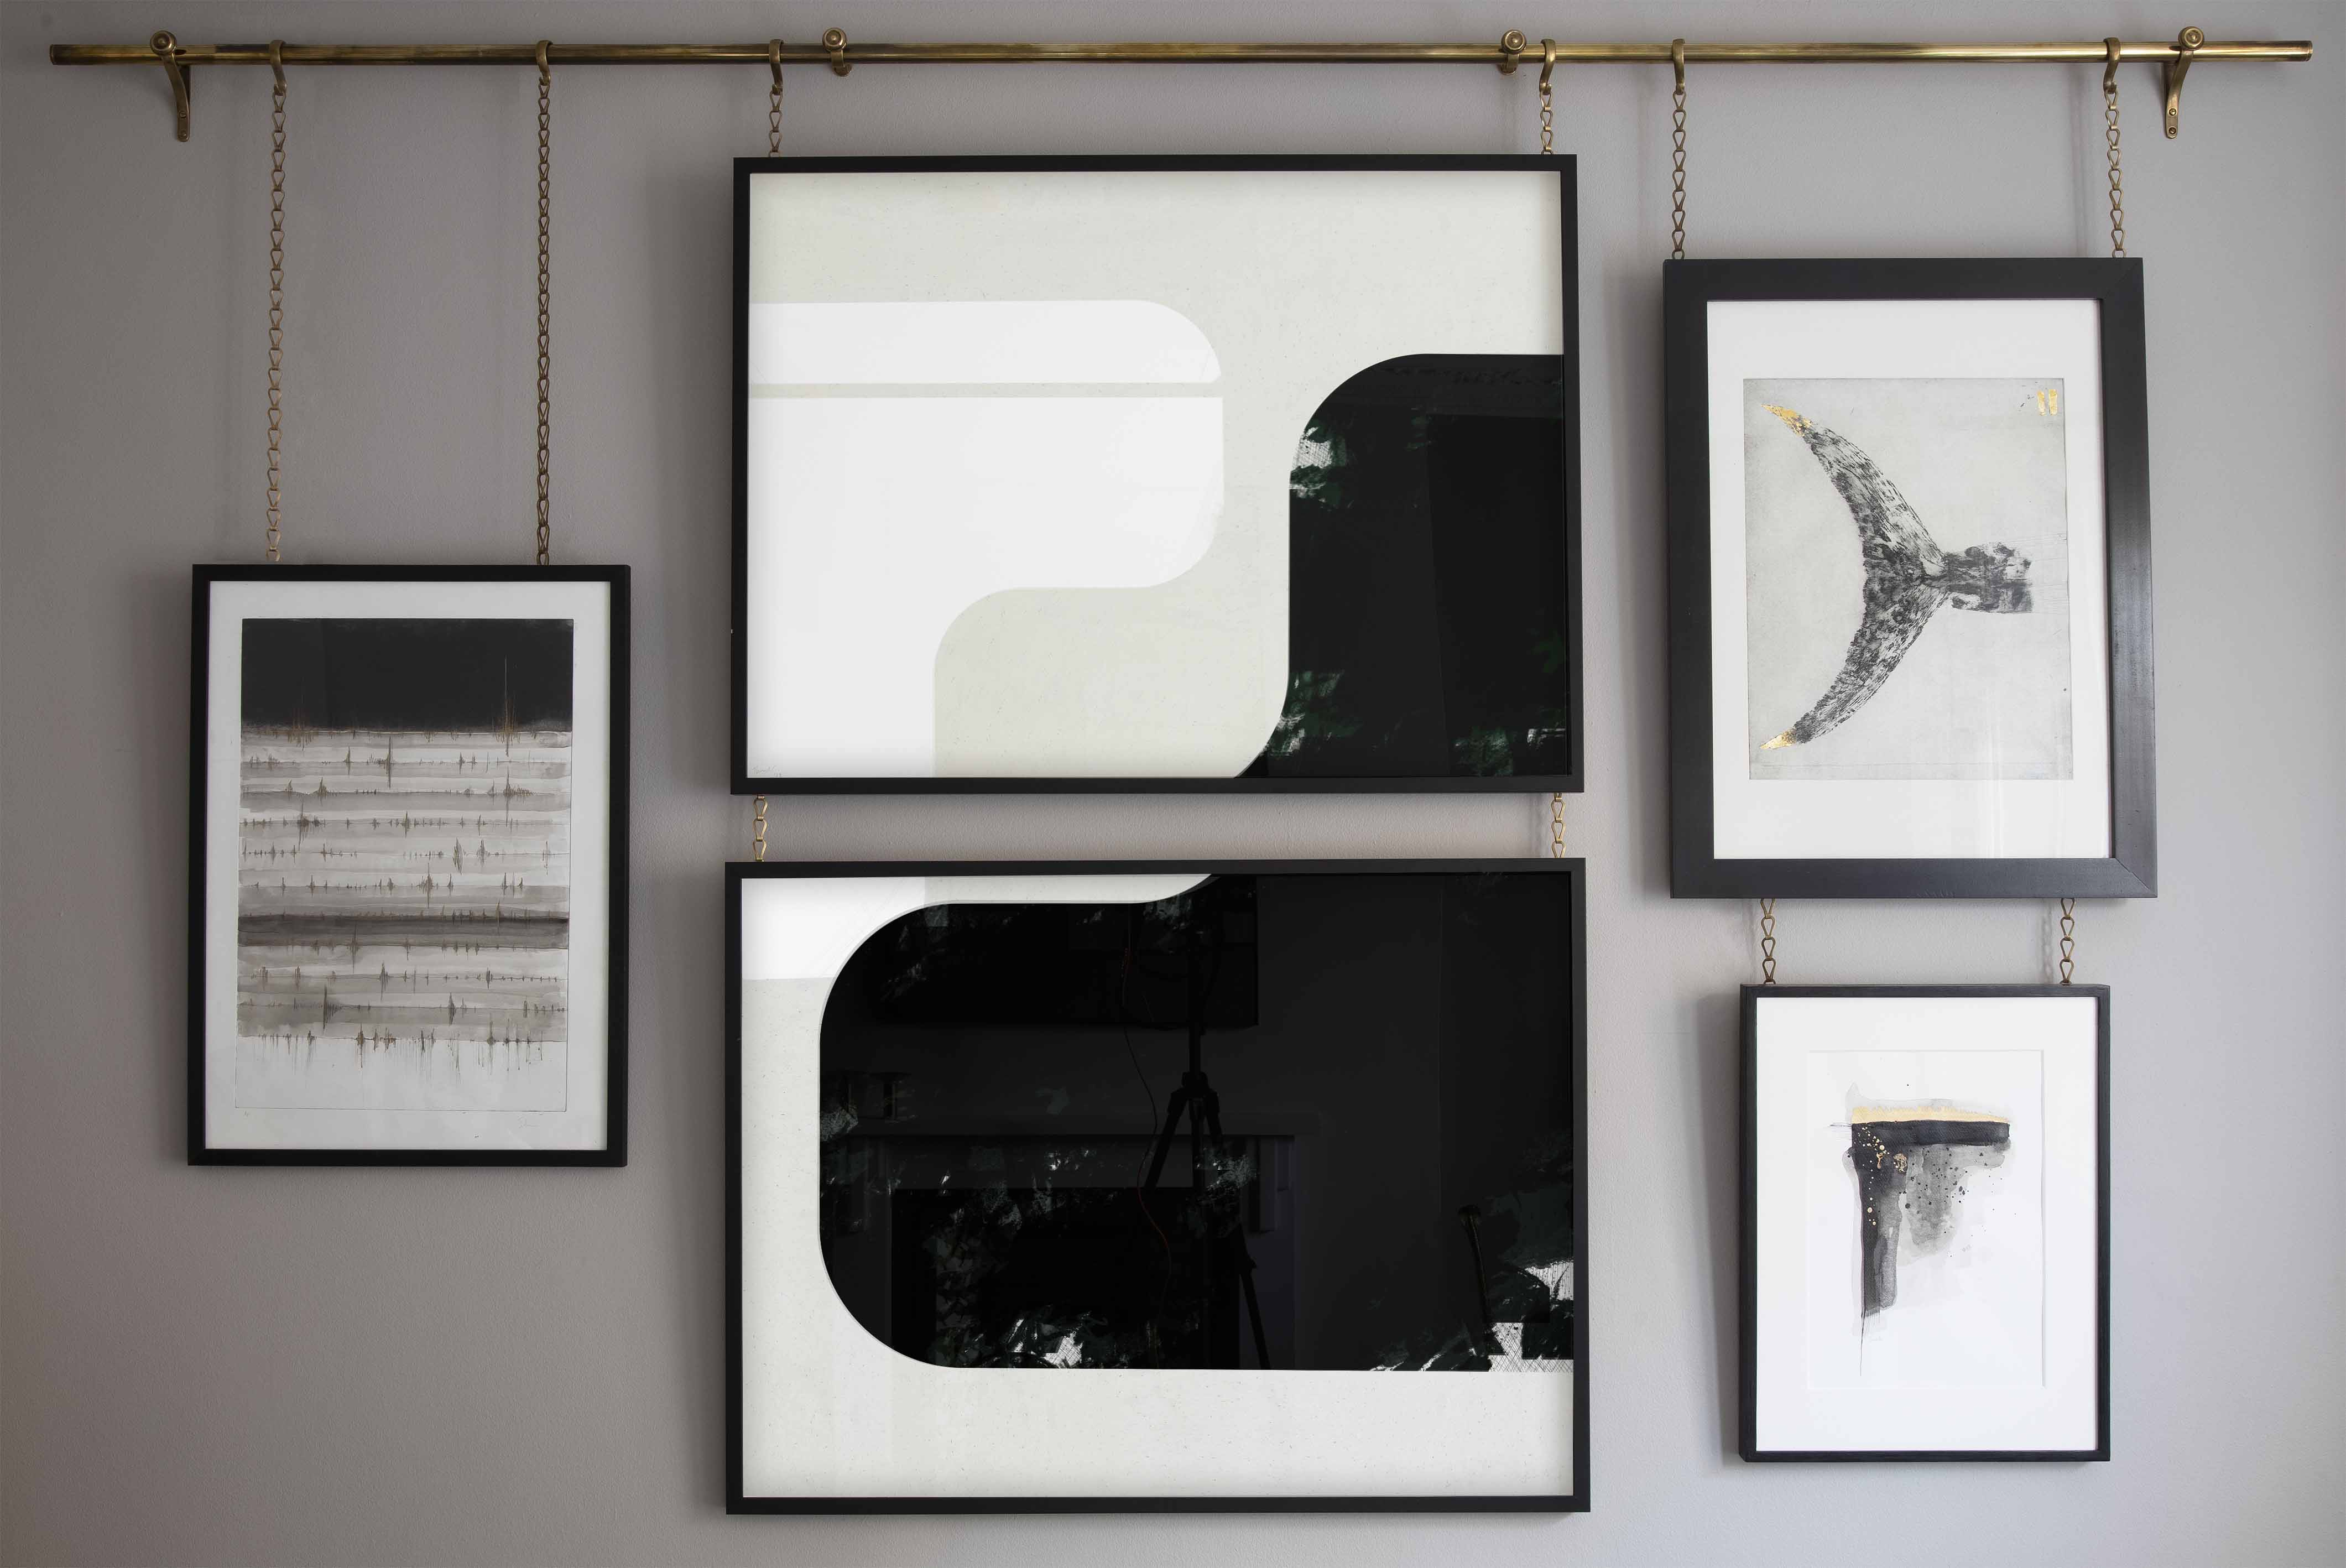 Notting Hill Apartment Interior Designed Luxury Brass Antique Hanging Art Rail Chains Monochrome Geometric Artist Dex